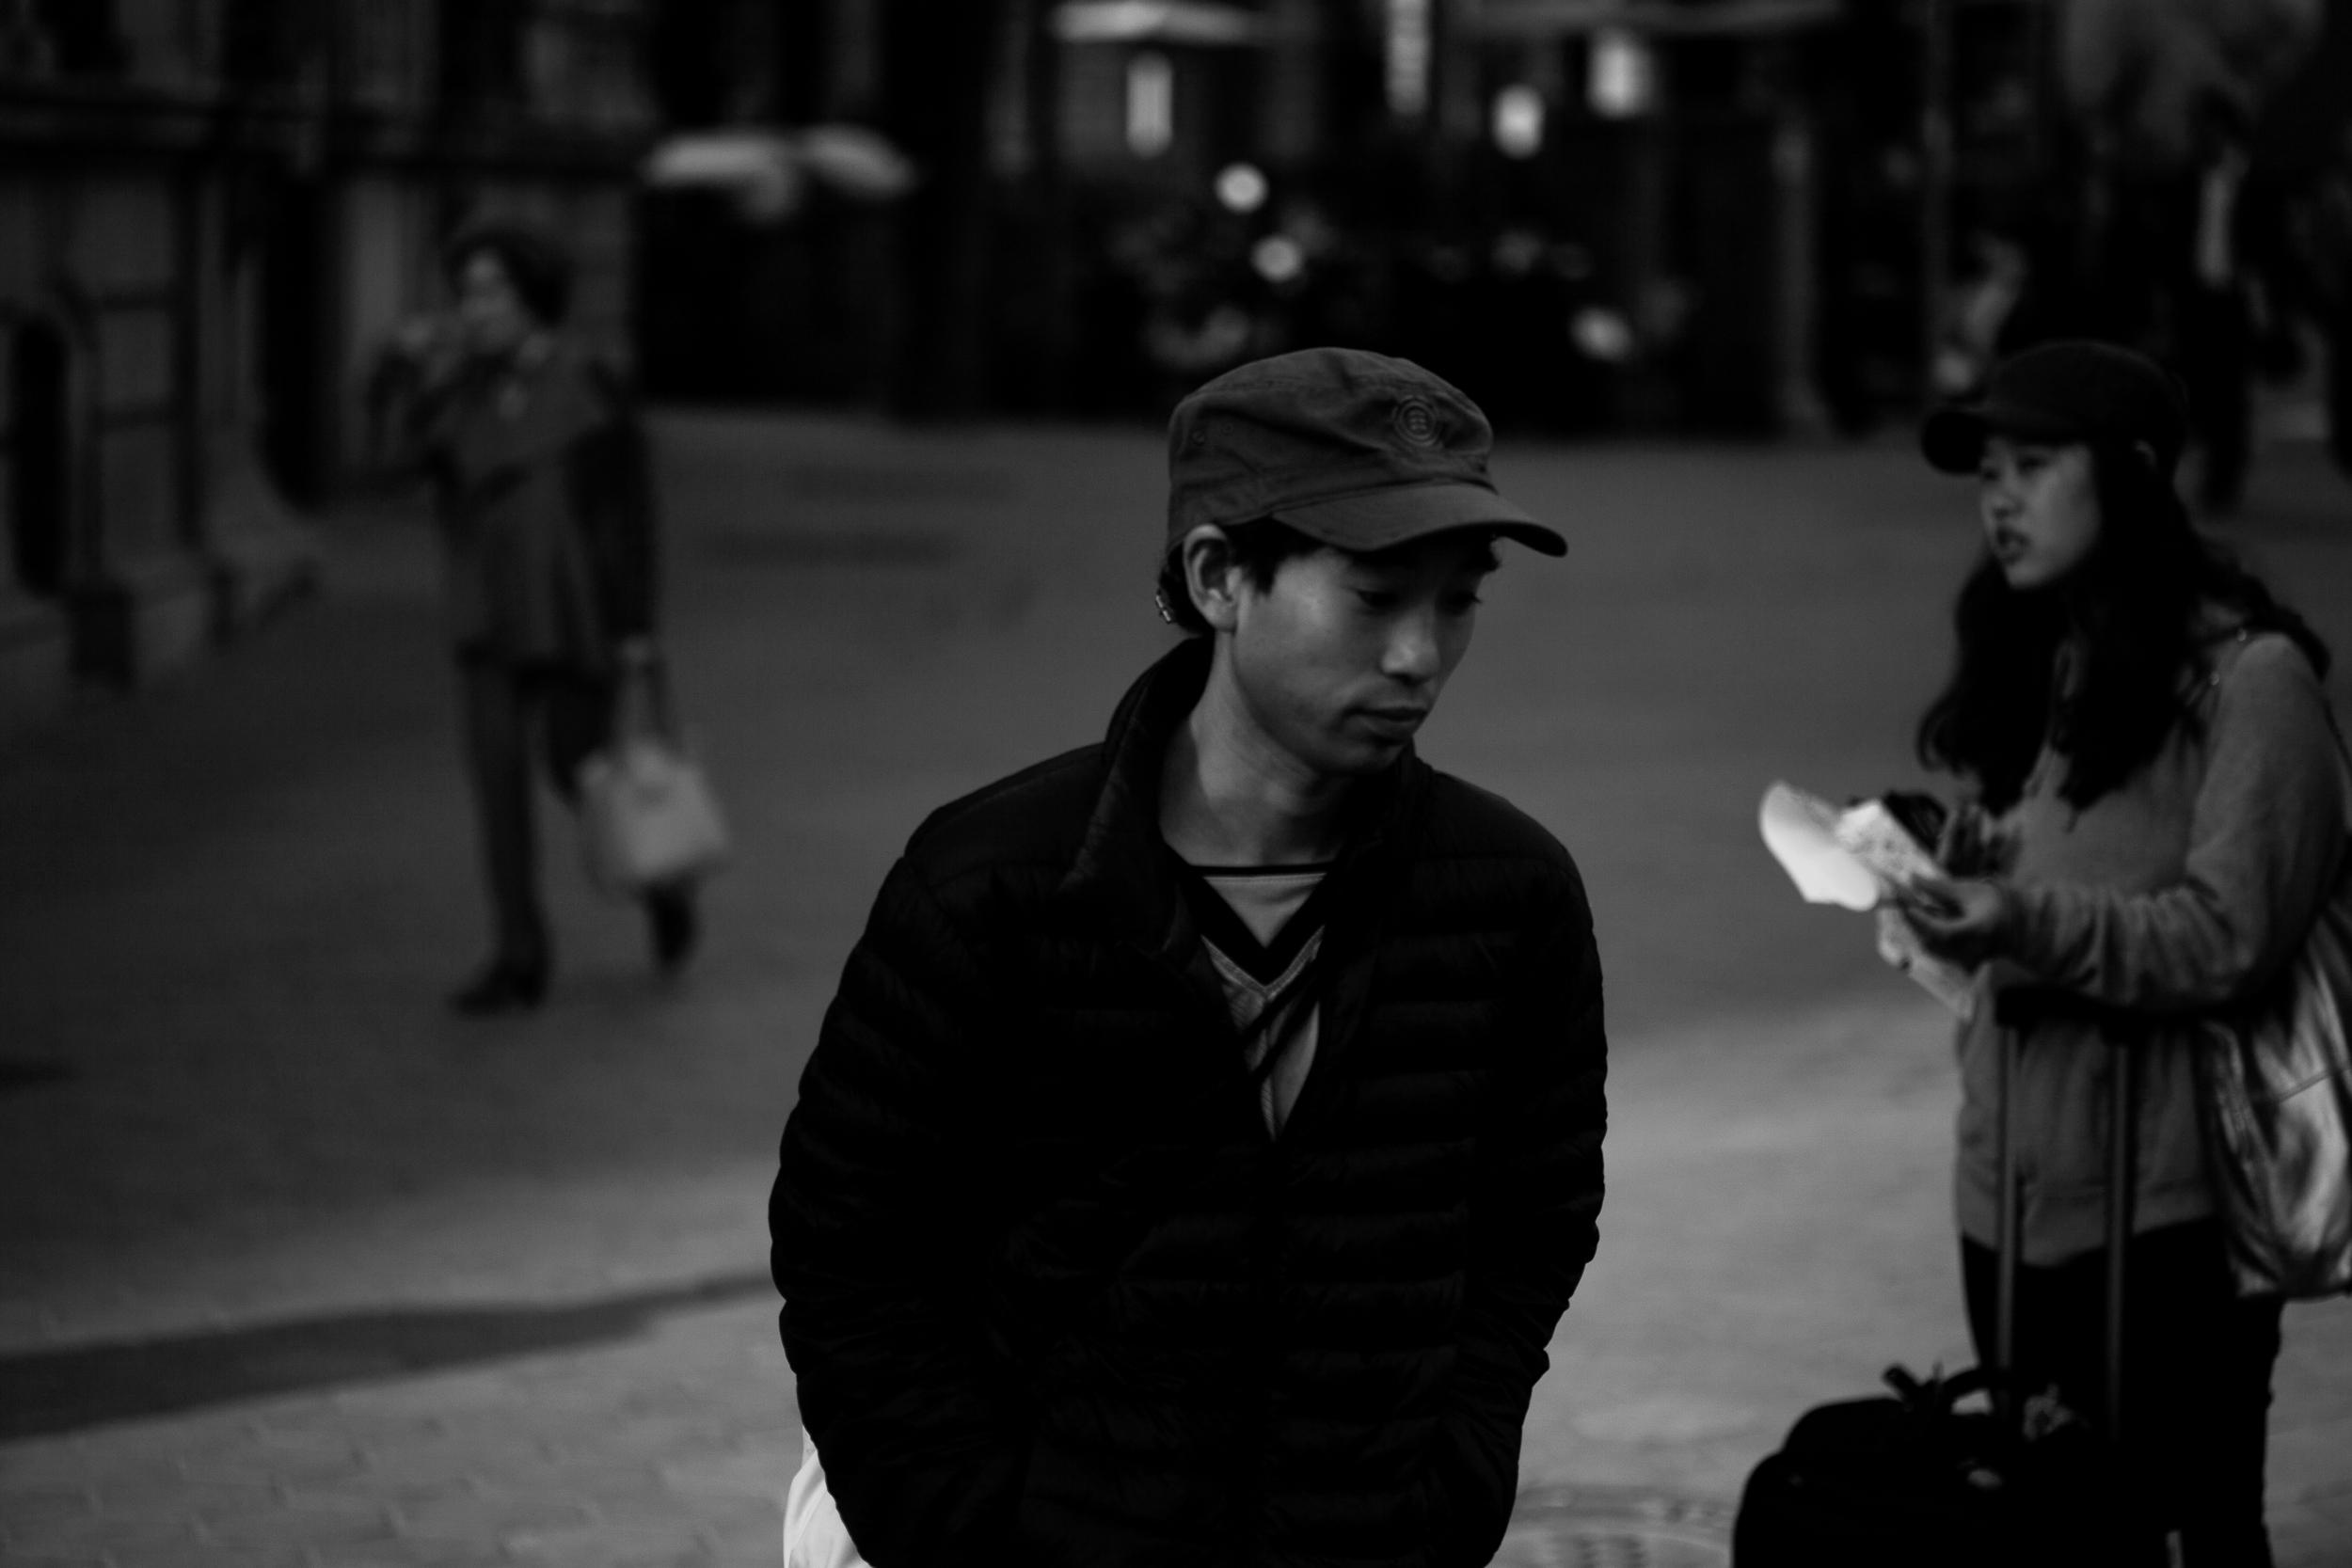 Chacon Images_Barcelona_Street_WEB_-0403.jpg